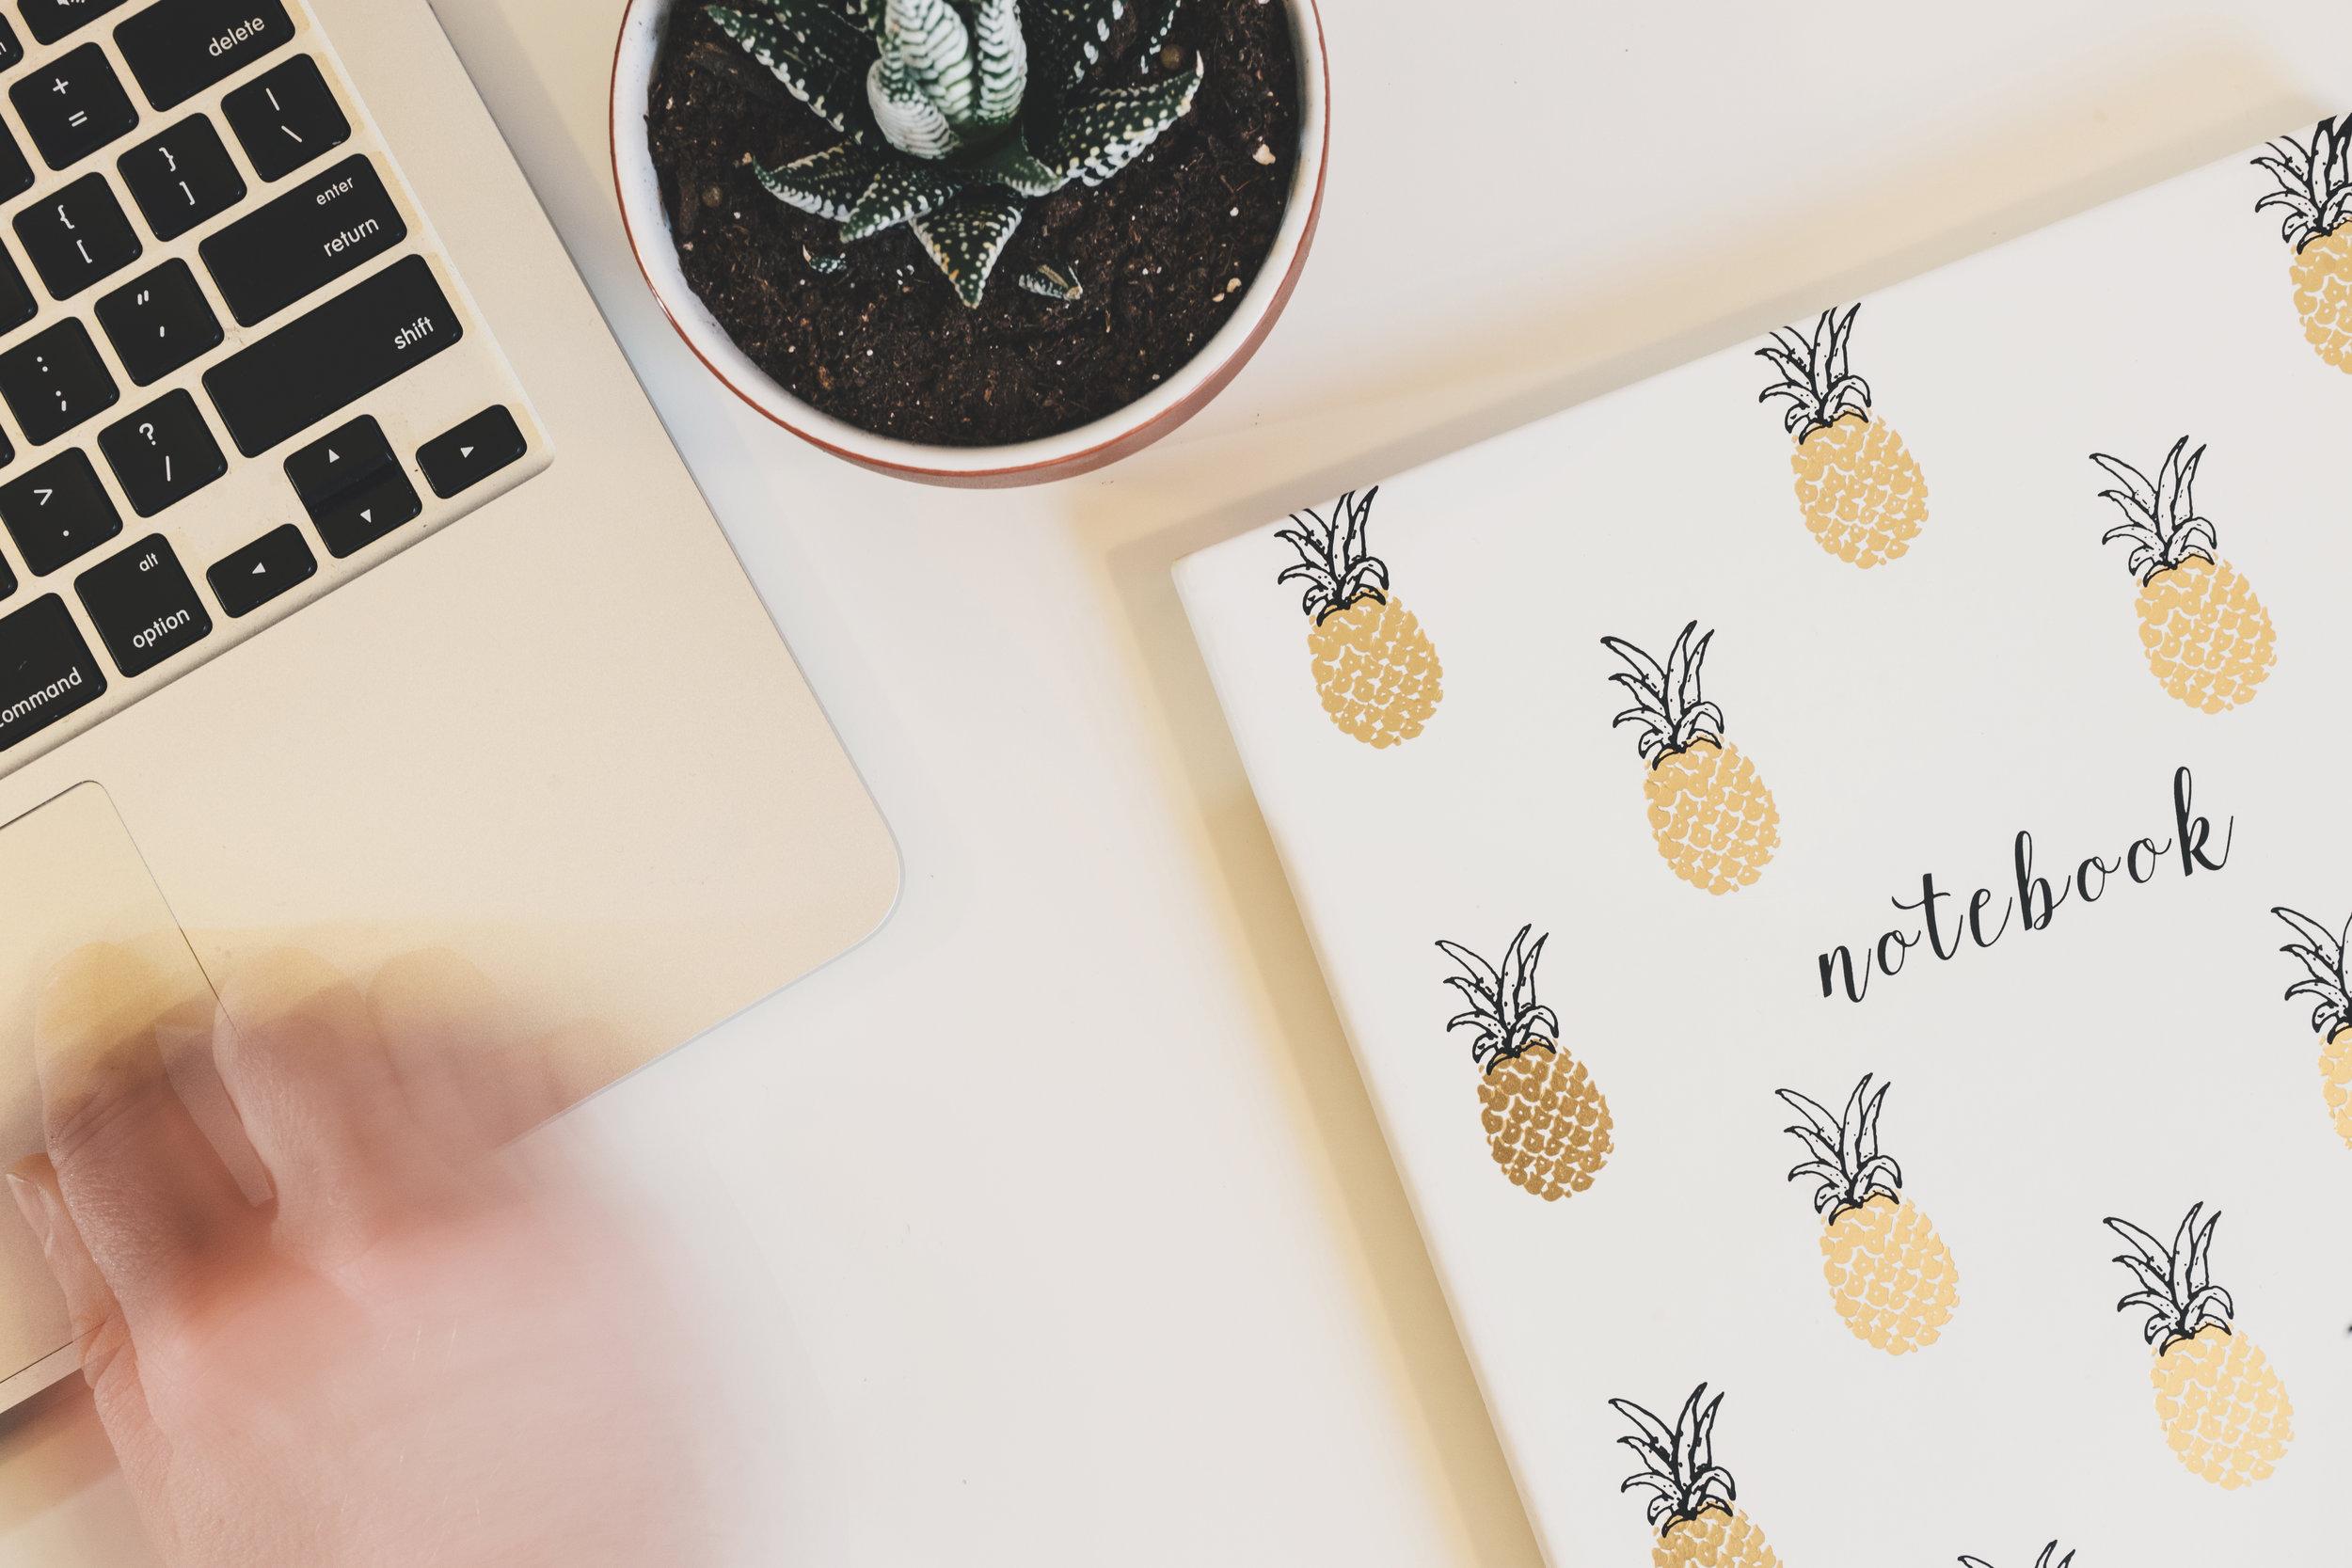 pineapple-supply-co-82911.jpg